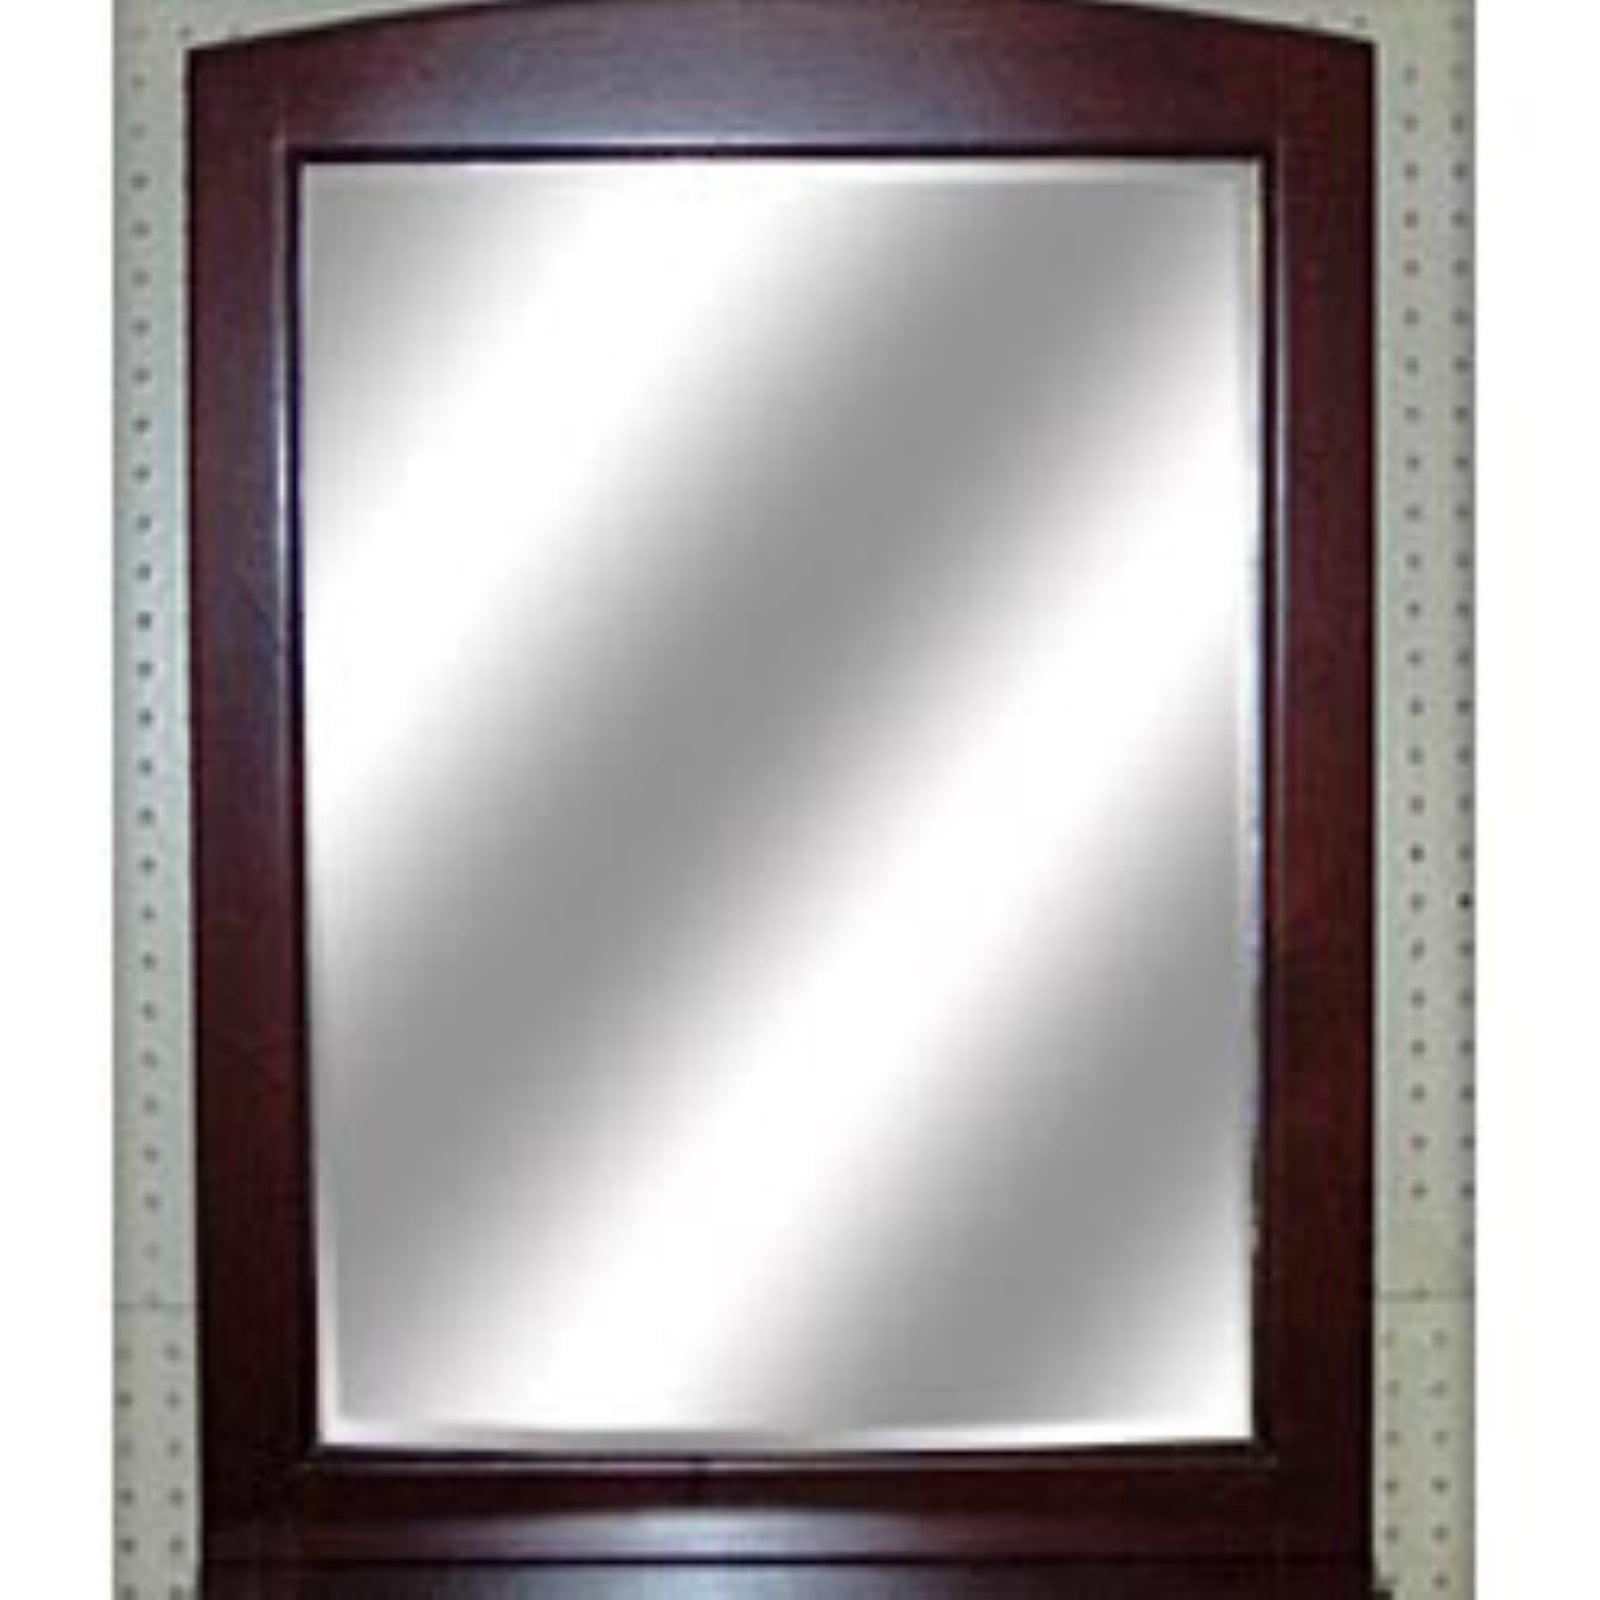 Windsor Decorative Vanity Mirror with Shelf